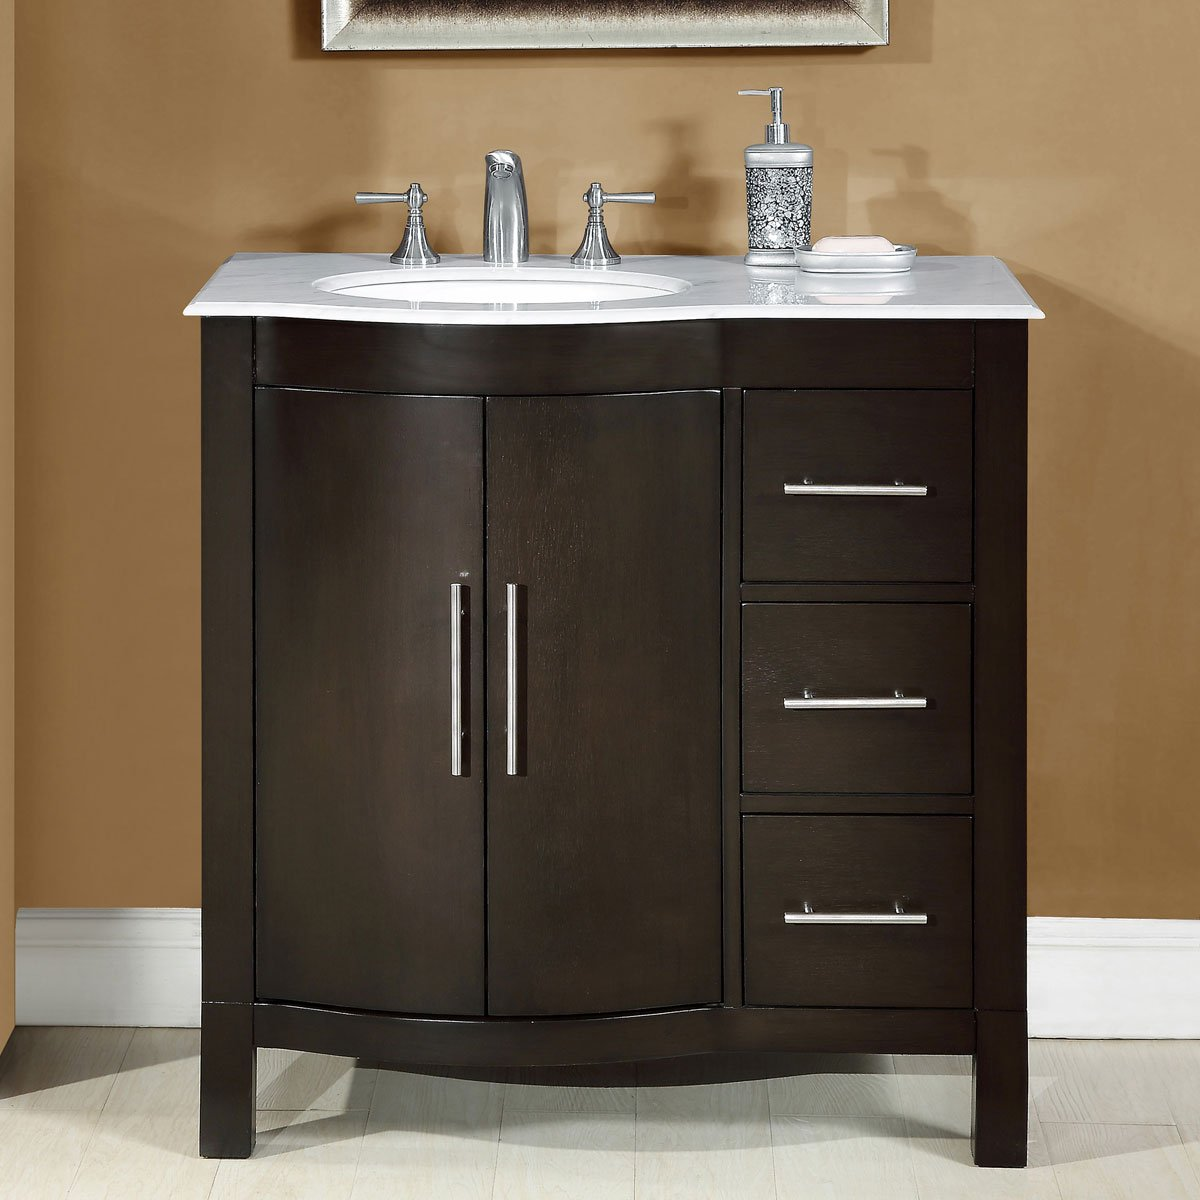 Silkroad Exclusive Single Left Sink Bathroom Vanity with Furniture Cabinet, 36-Inch